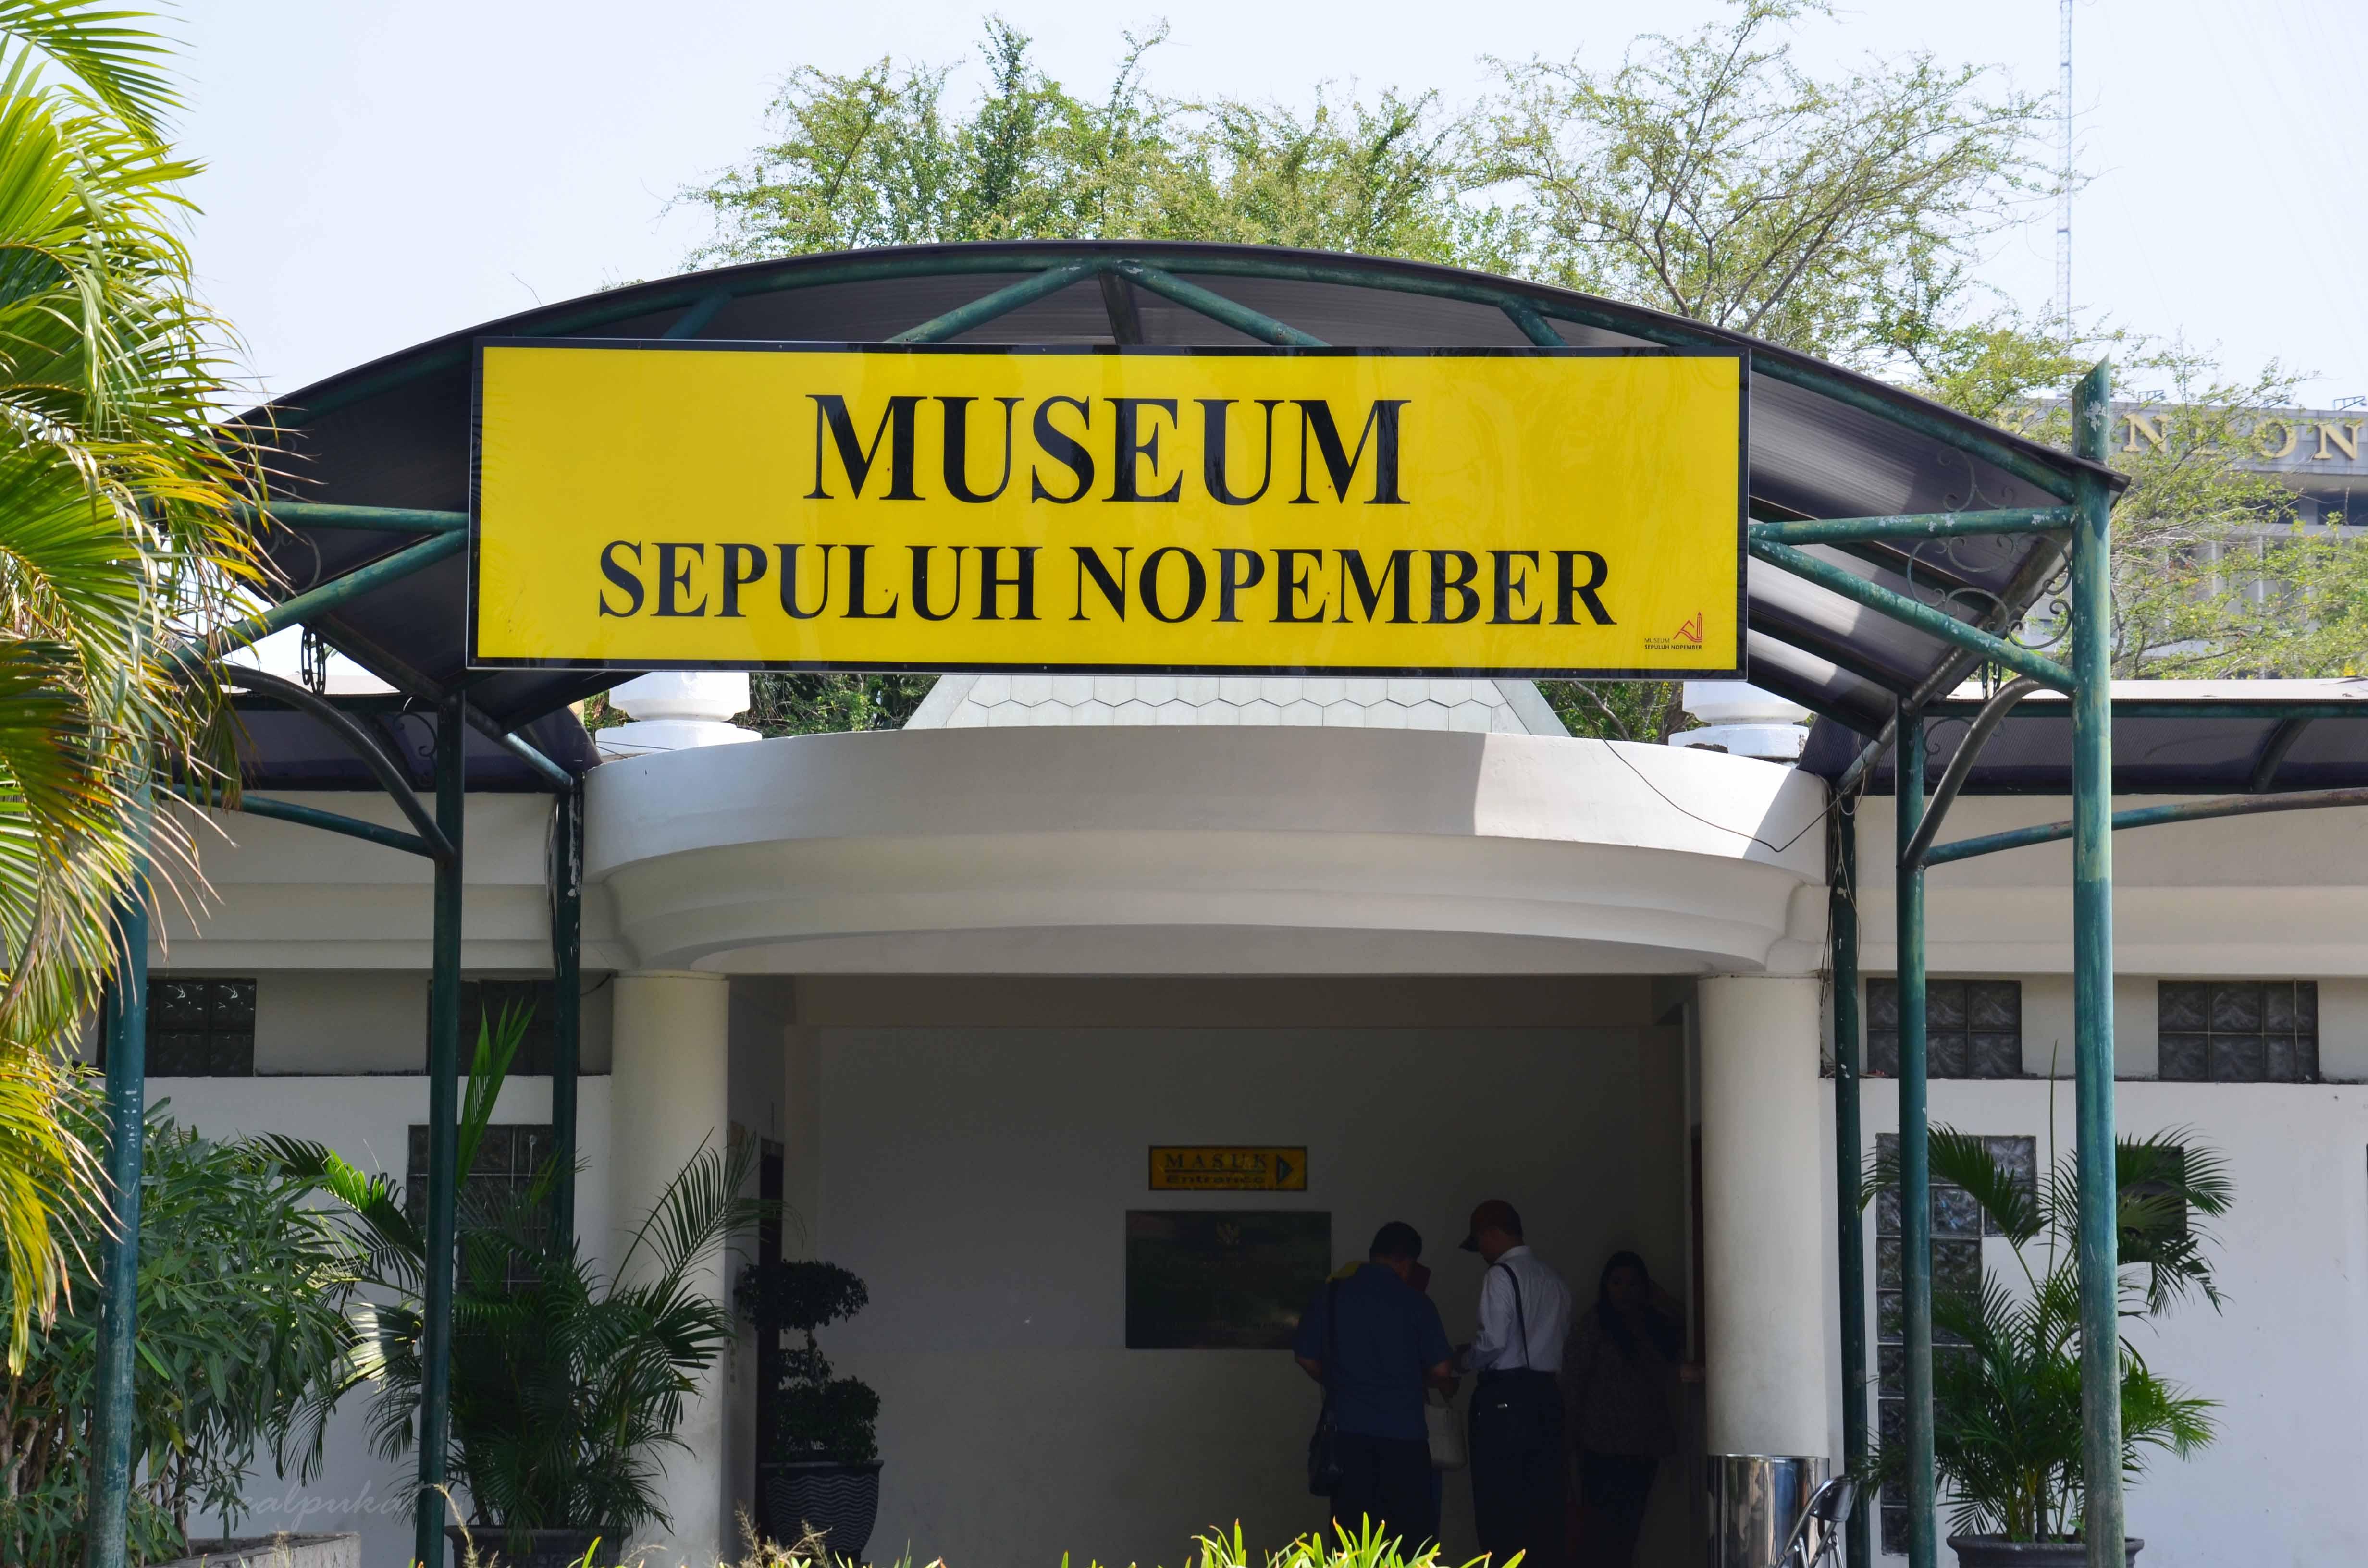 Surabaya Nikmati Wisata Sejarah Tugu Pahlawan Museum 10 Nopember Aya